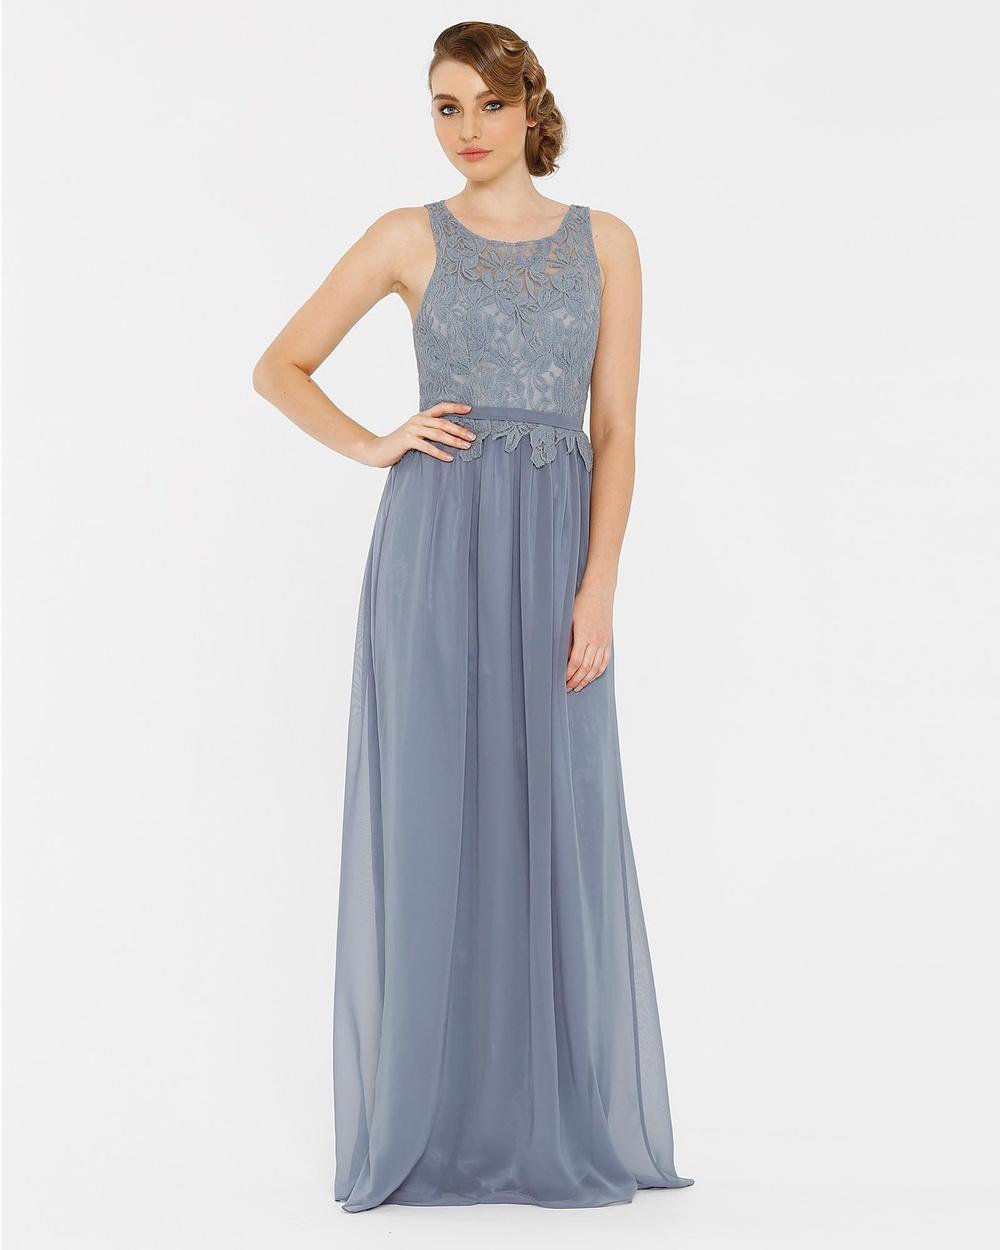 Tania Olsen Designs Sophia Dress Bridesmaid Dresses Dusty blue Sophia Dress